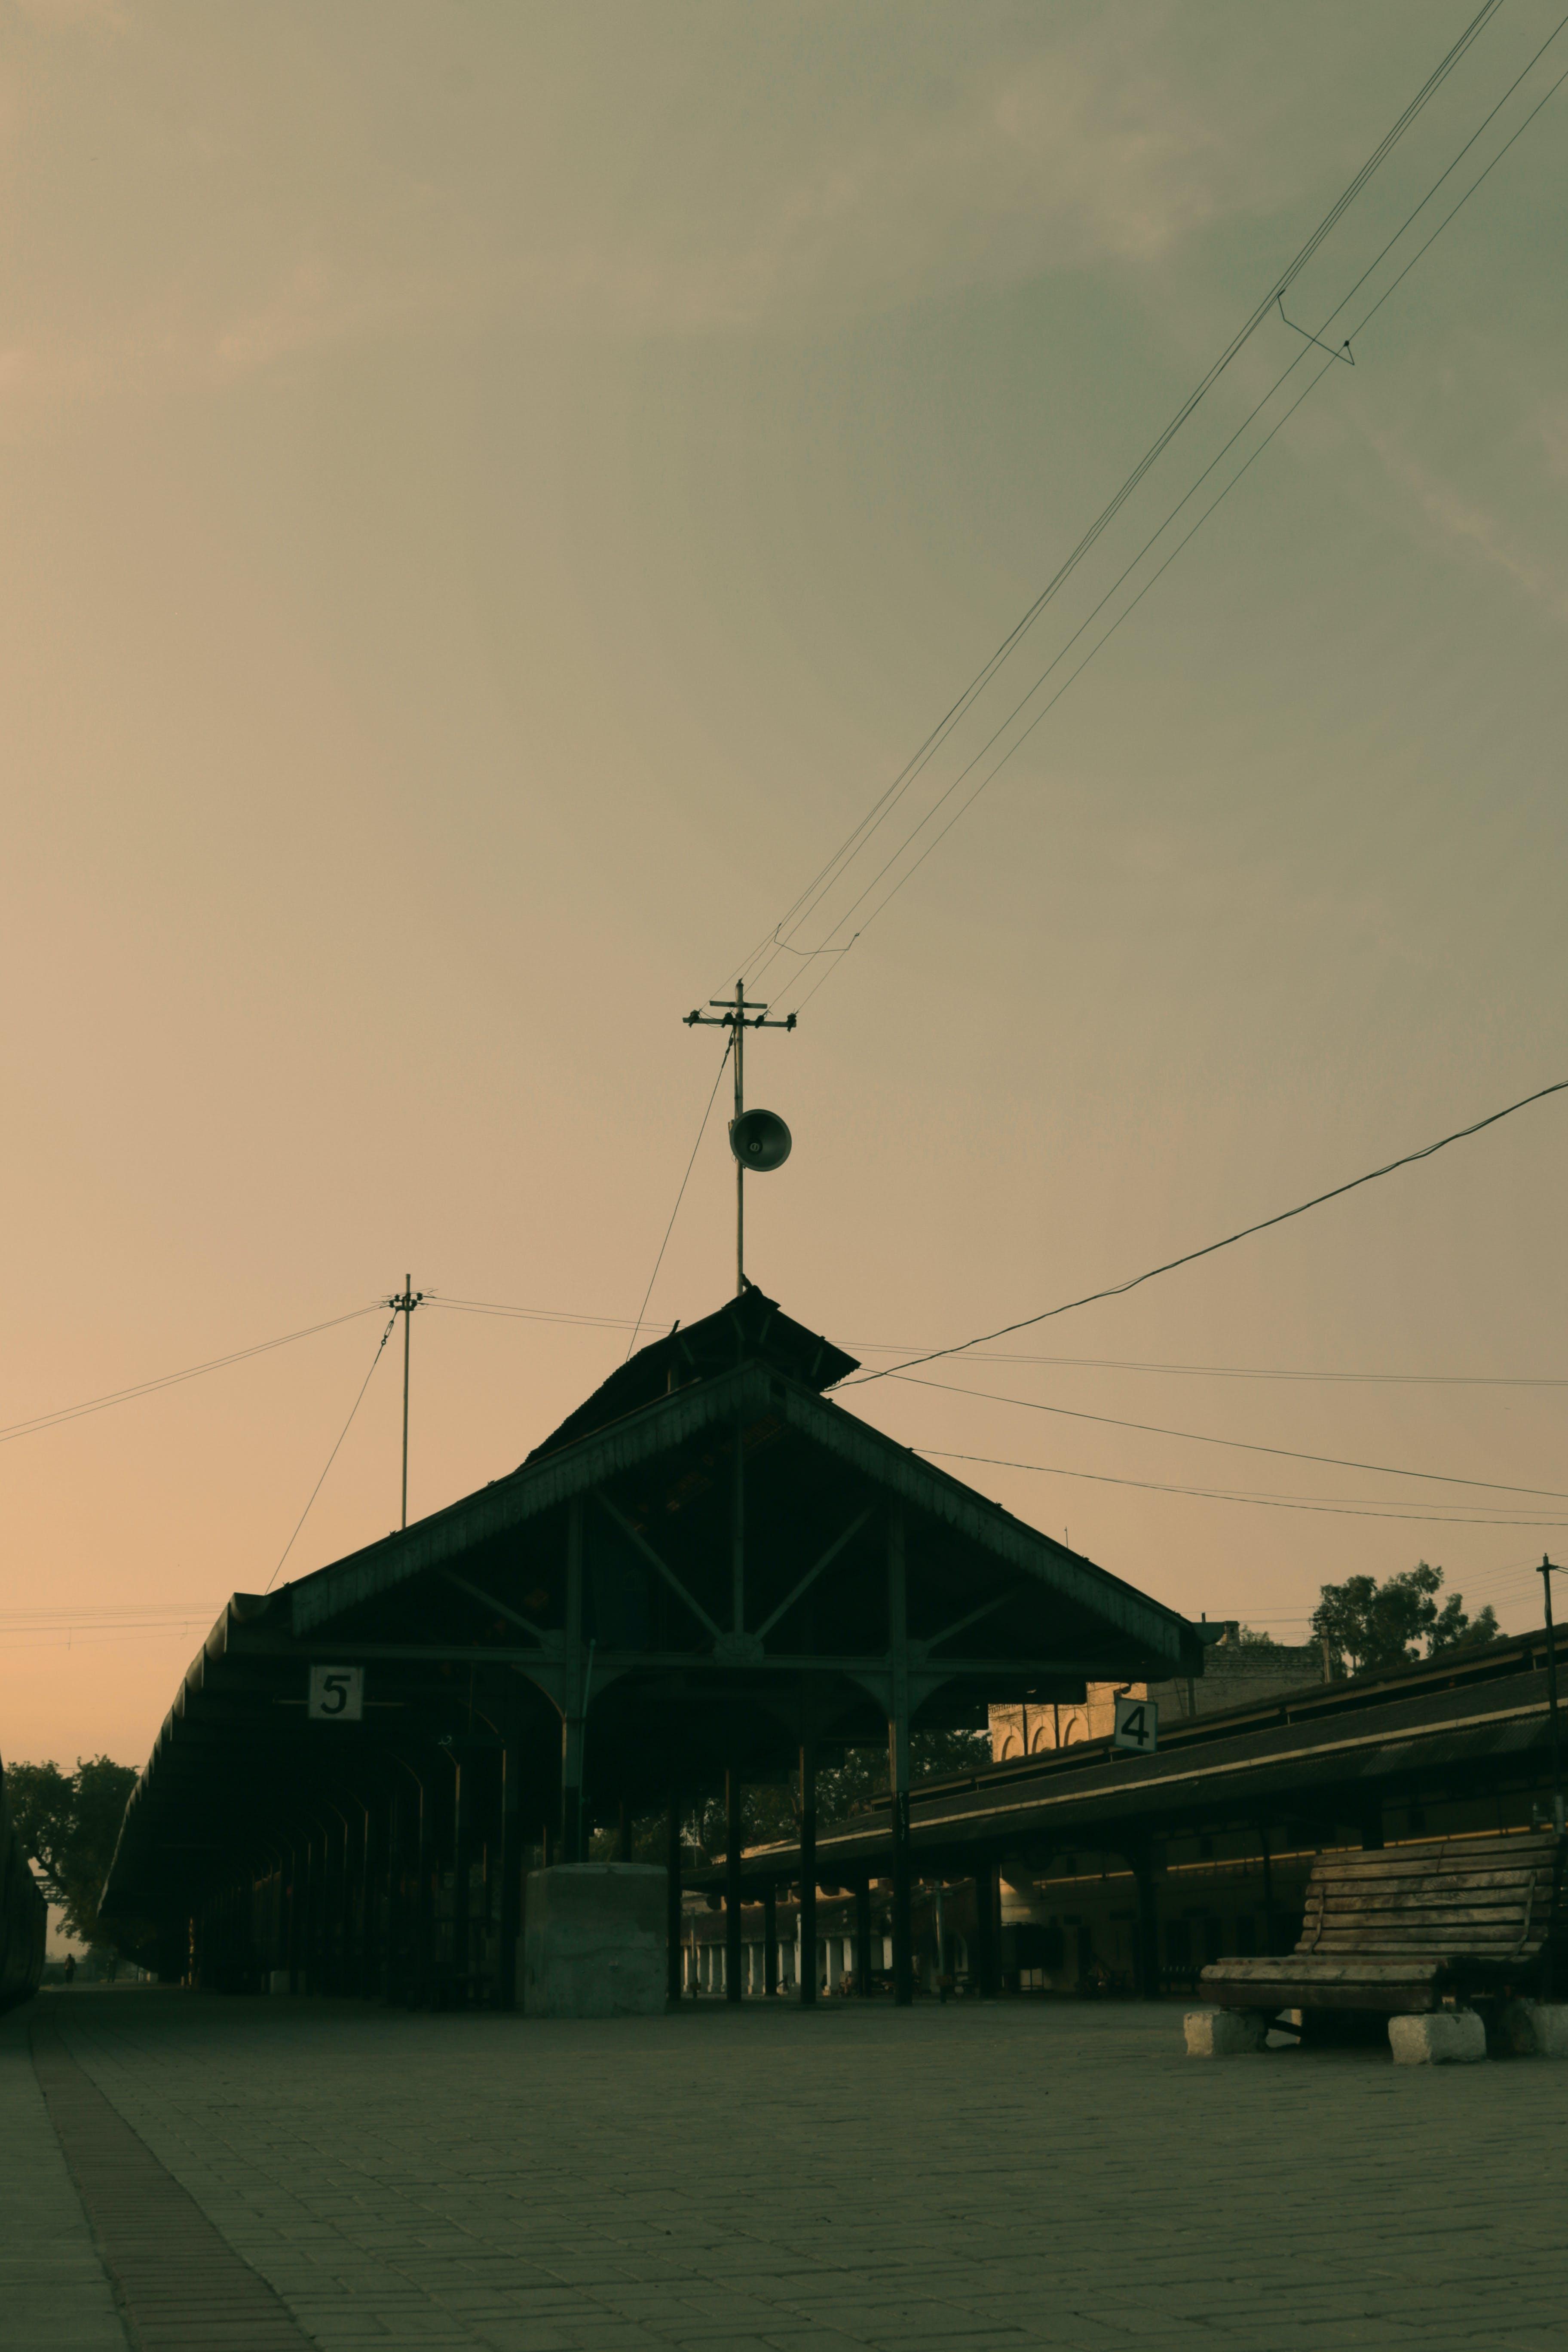 Free stock photo of railway station, railway station fort, wazirabad railway station